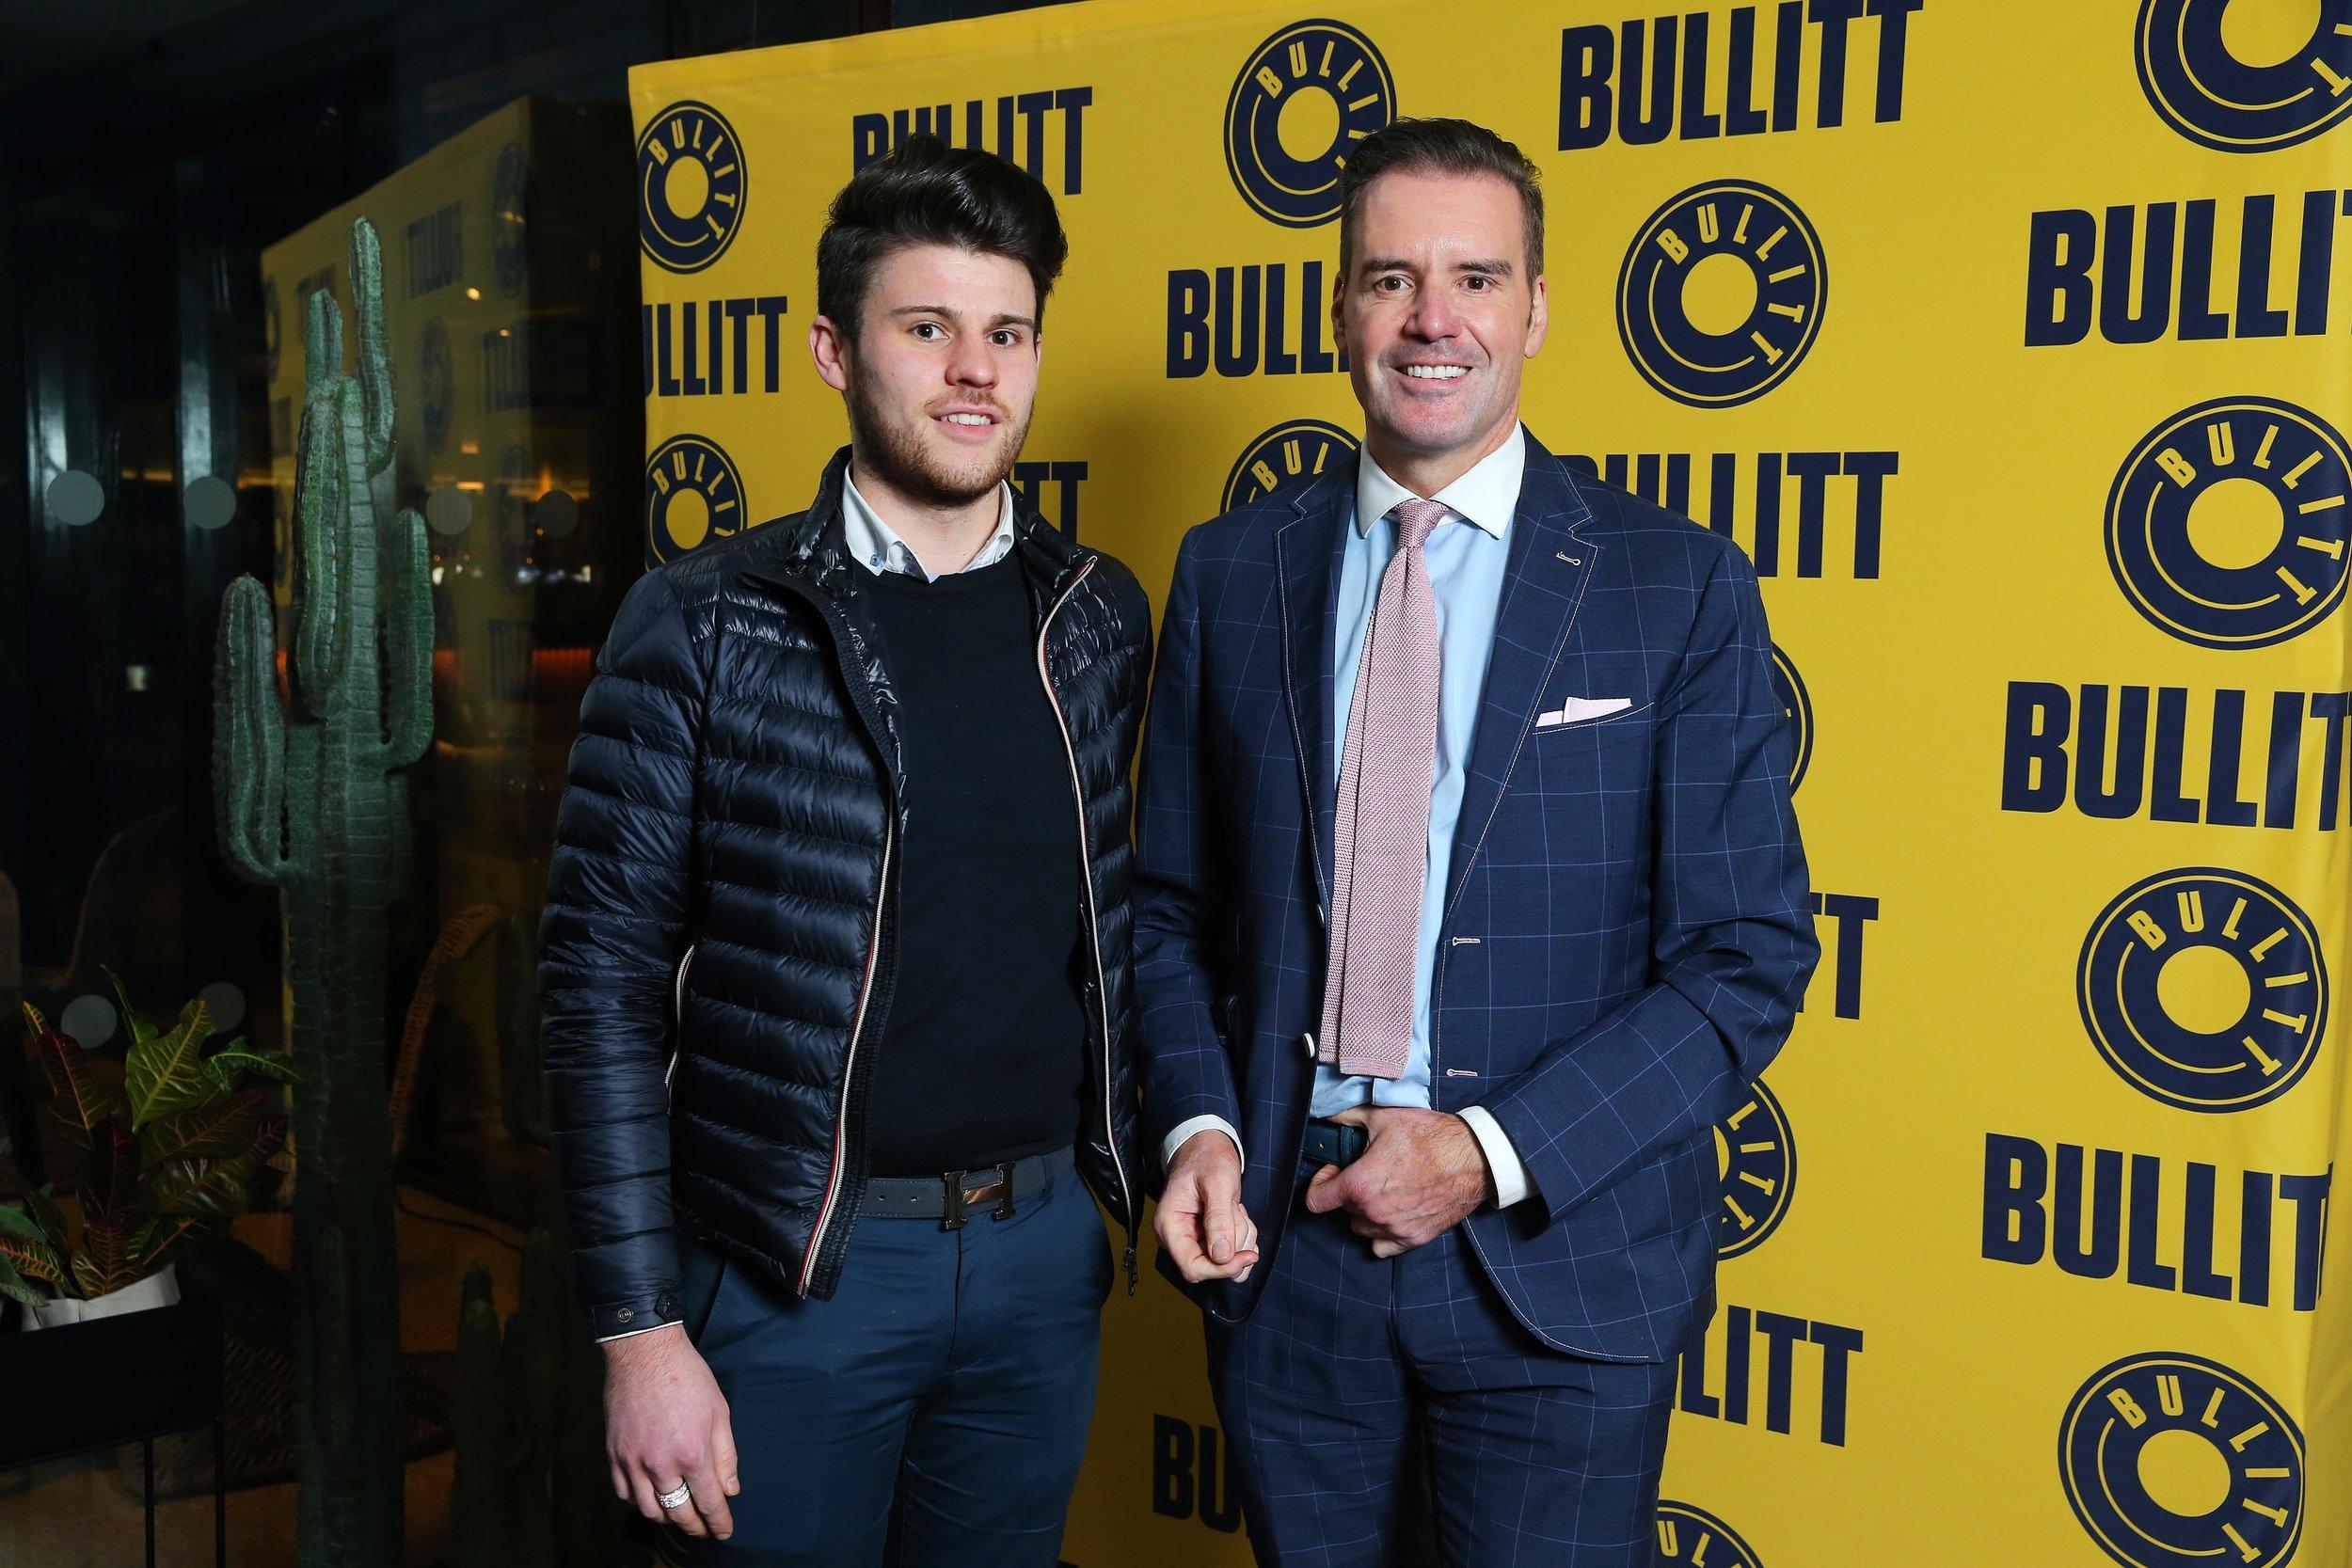 Bullitt Launch Socials 01.JPG